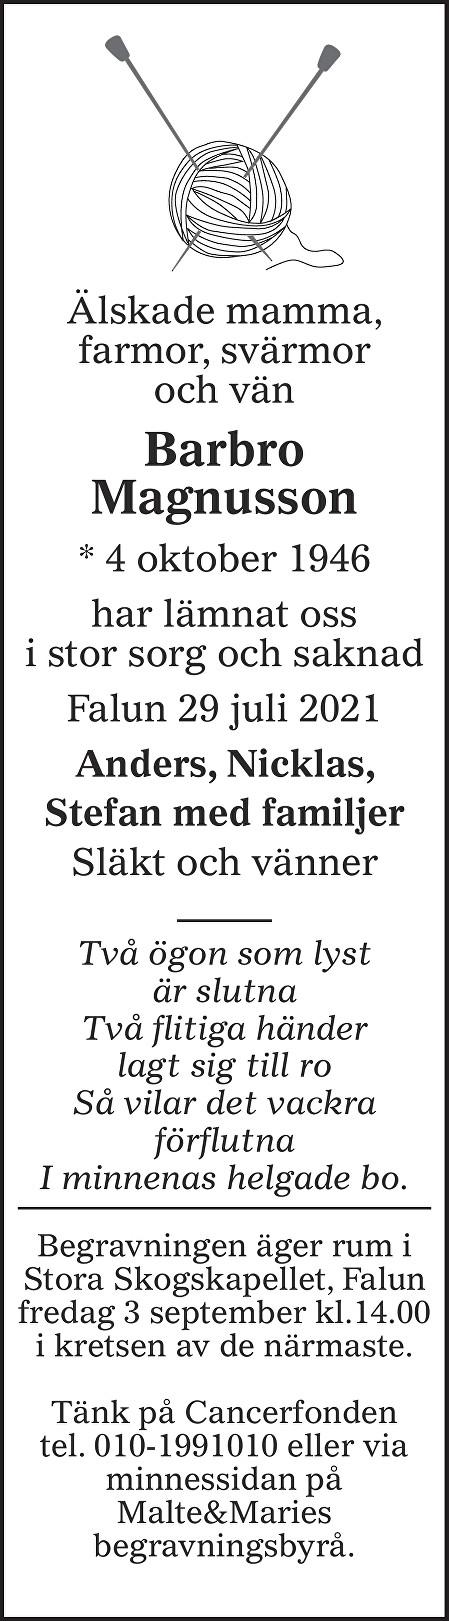 Barbro Magnusson Death notice